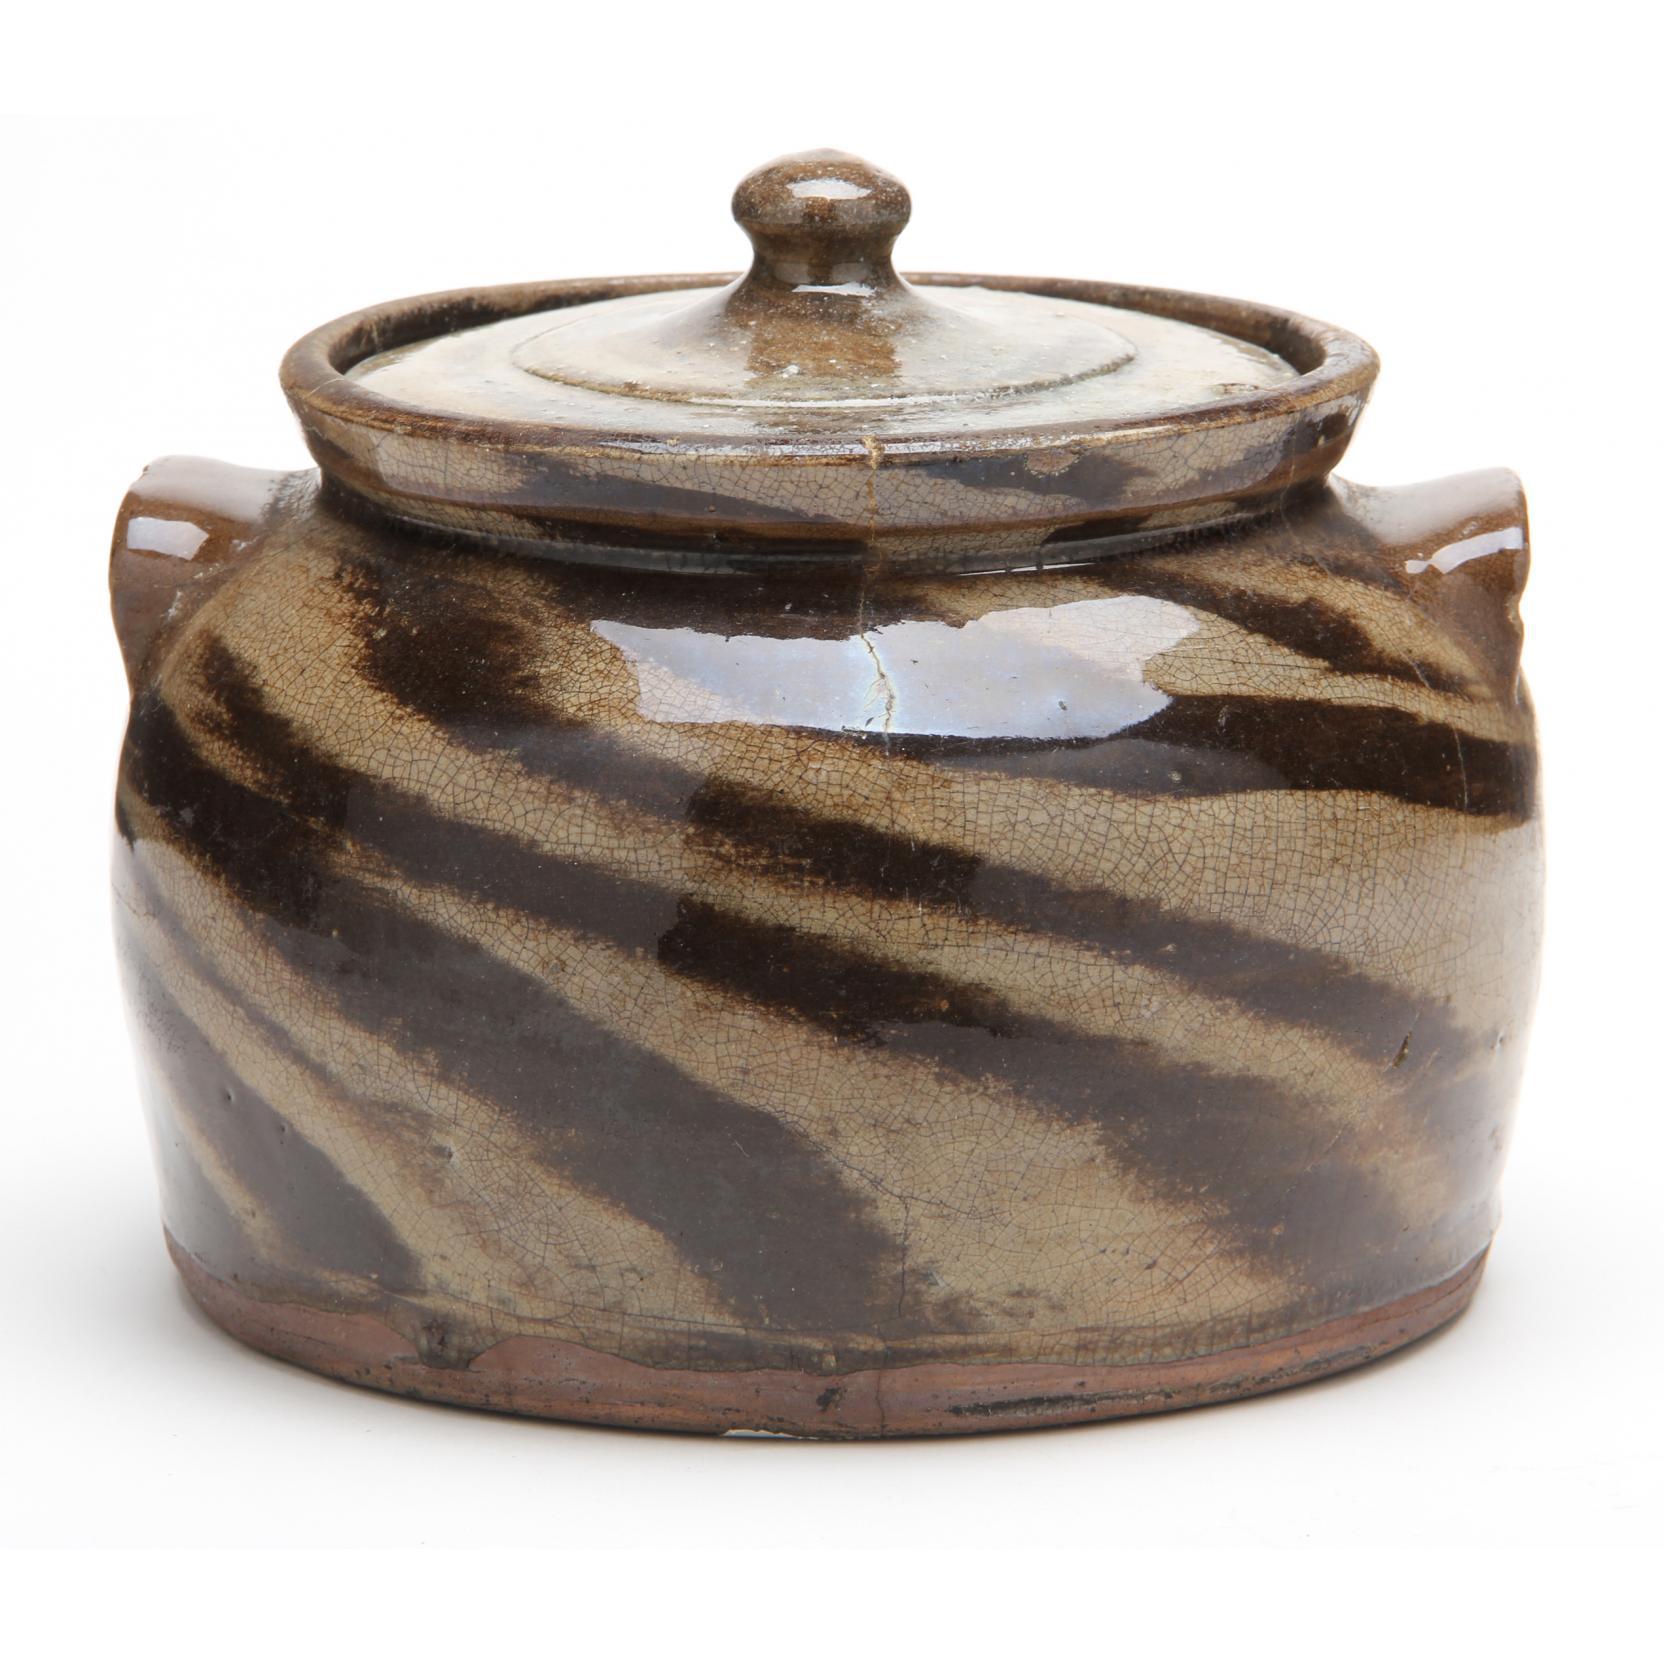 nc-pottery-beanpot-reinhardt-brothers